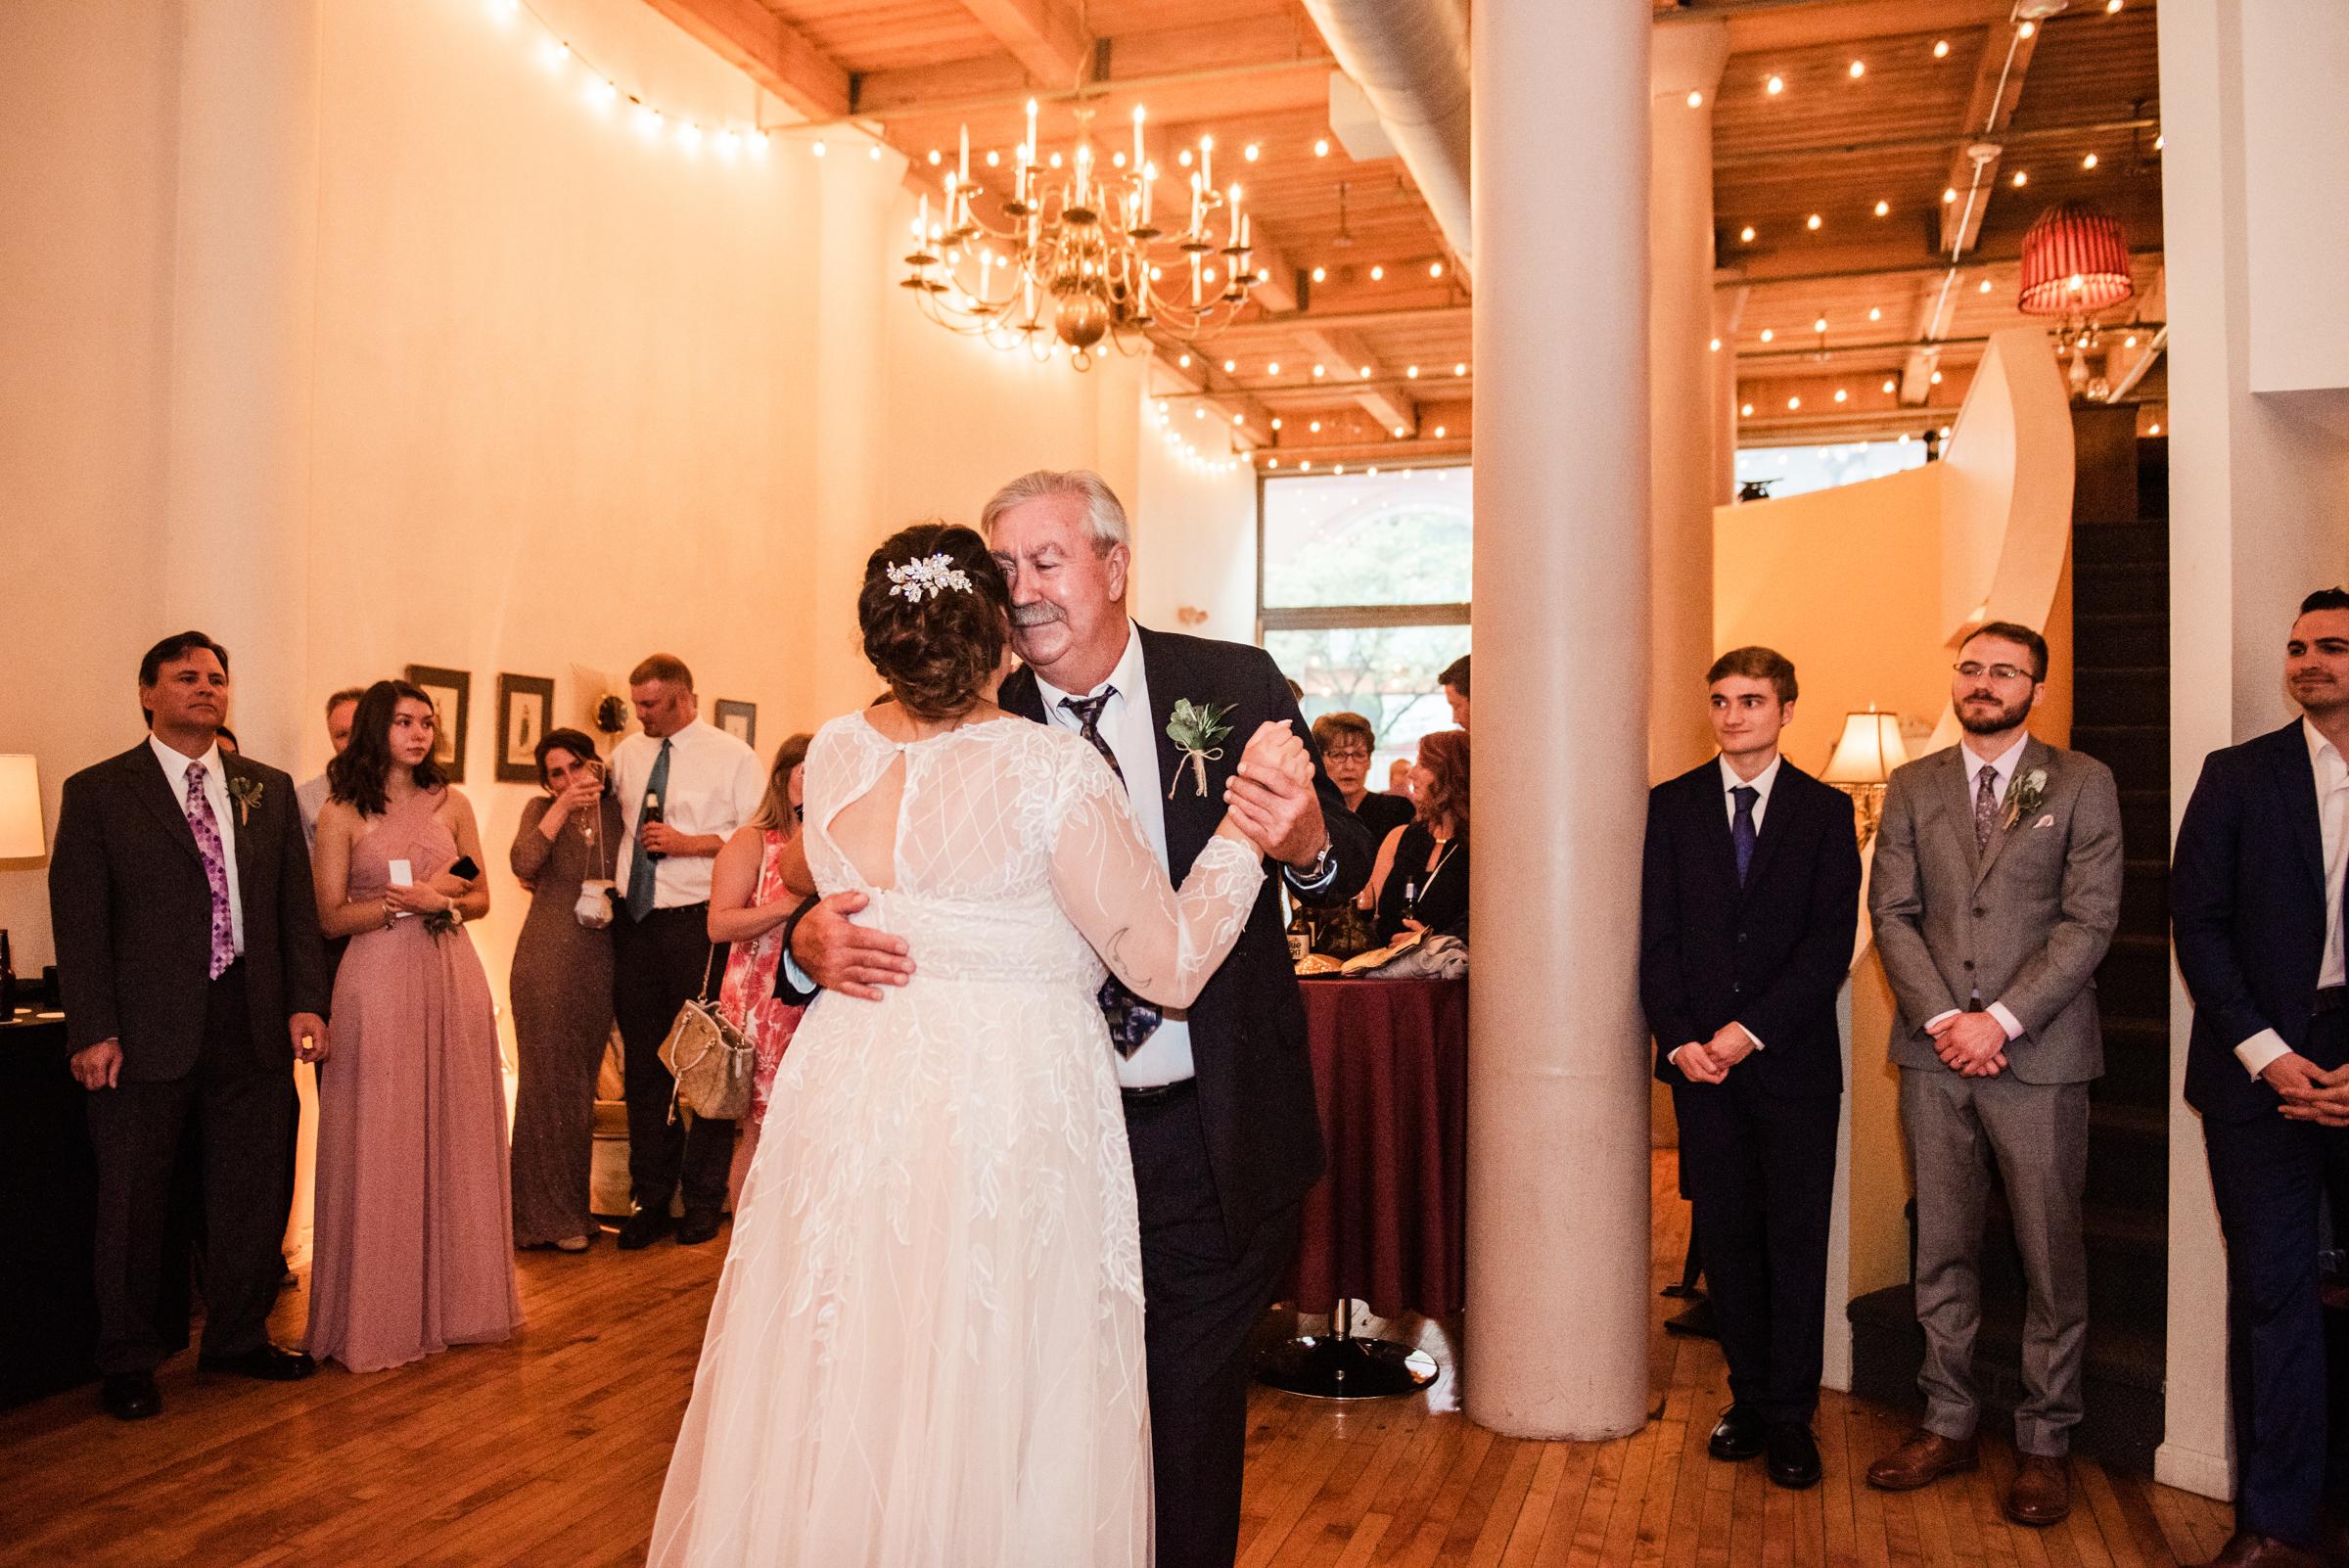 Studio_180_Lamberton_Conservatory_Rochester_Wedding_JILL_STUDIO_Rochester_NY_Photographer_DSC_9165.jpg